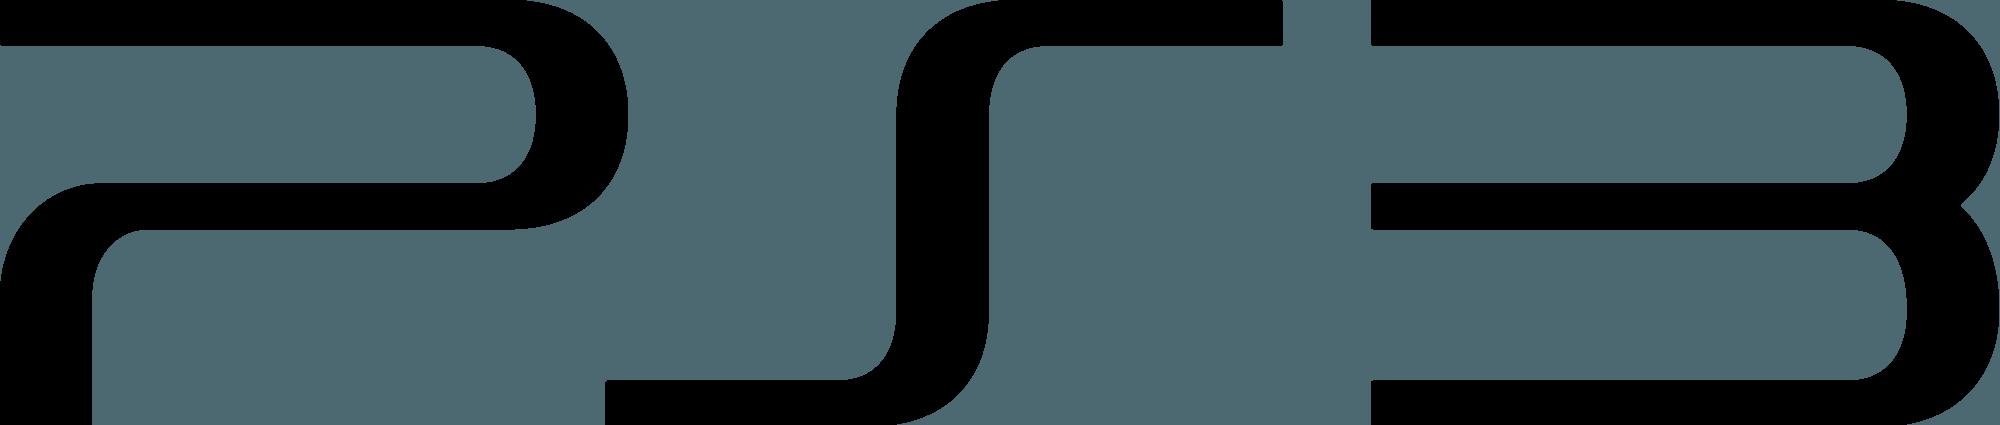 PlayStation 3 Logo - LogoDix